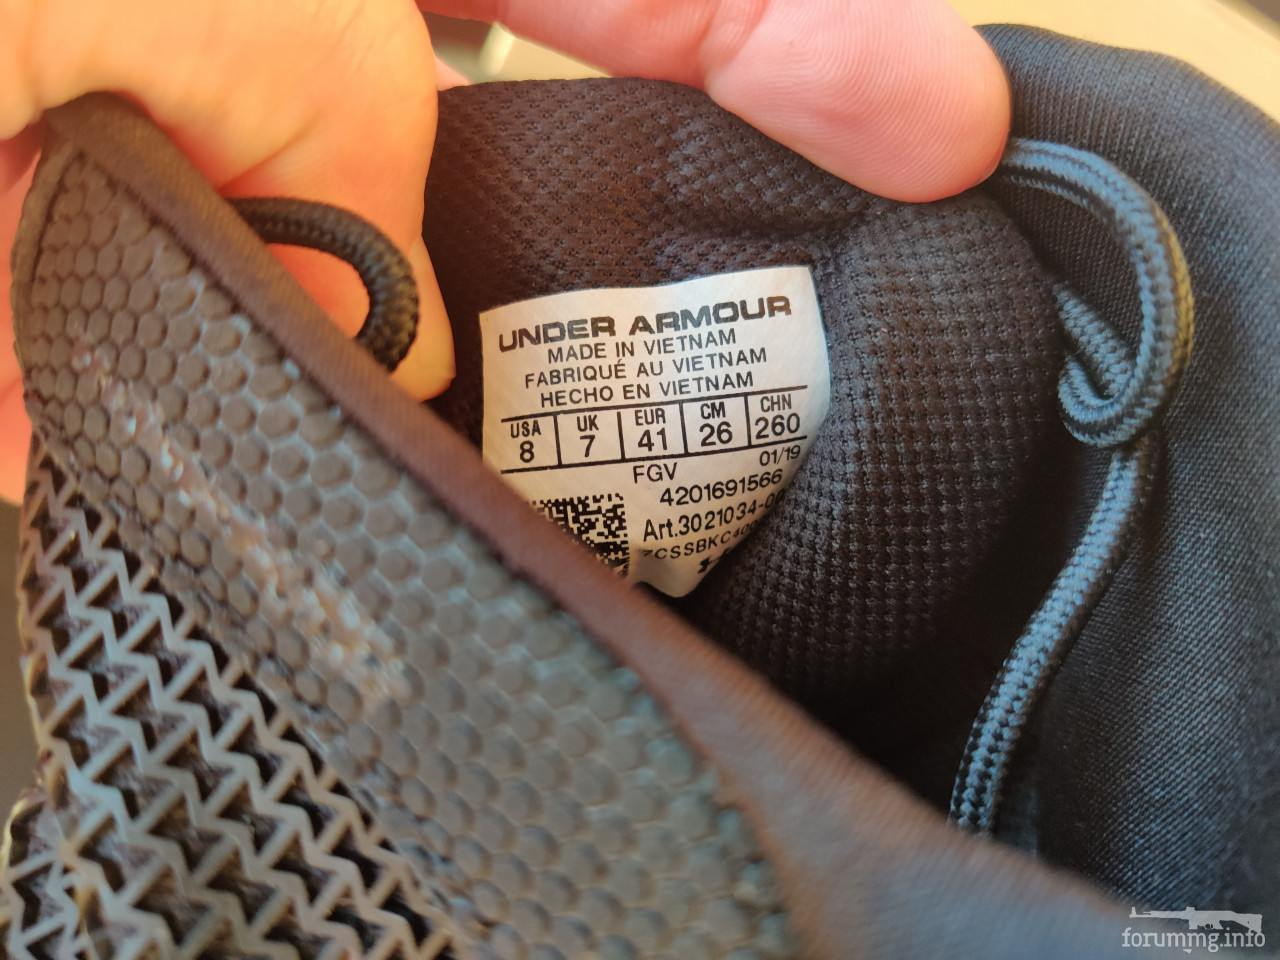 138694 - Under Armour Valsetz Boots (Under Armour Tactical Boots) 40-47р